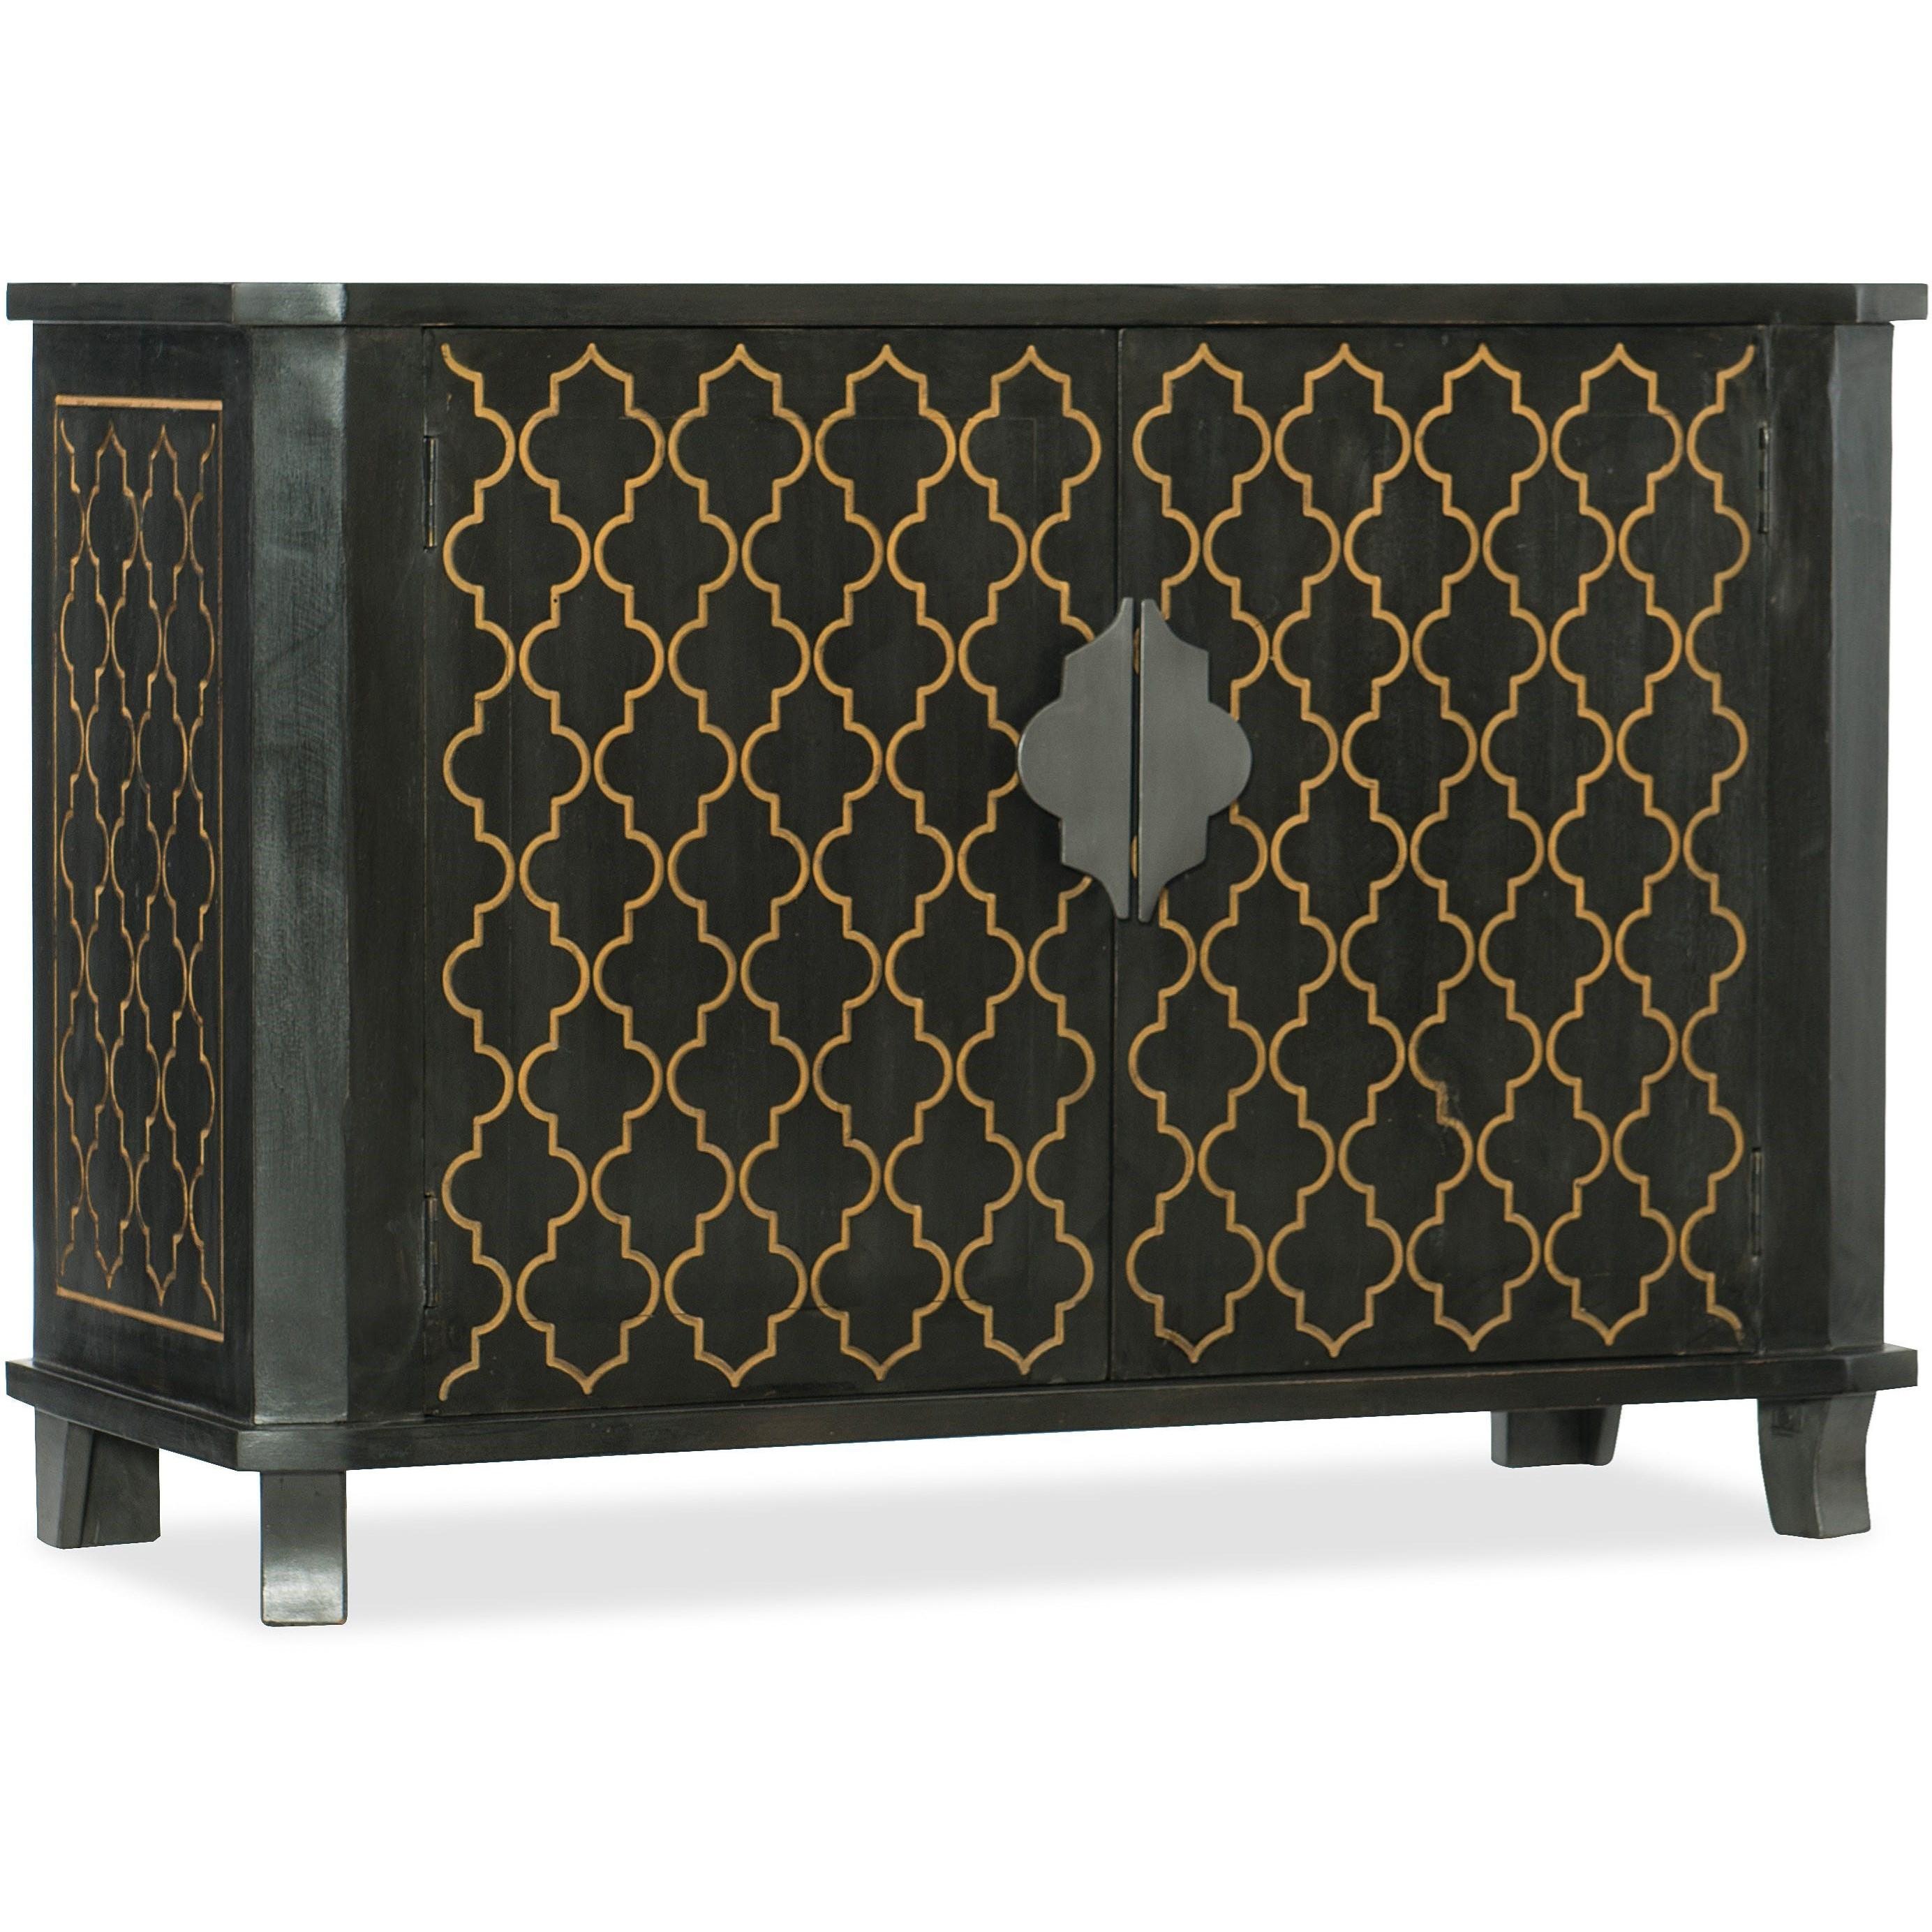 Hooker Furniture Living Room Accents 46 Quatrefoil Accent Chest Olinde 39 S Furniture Accent